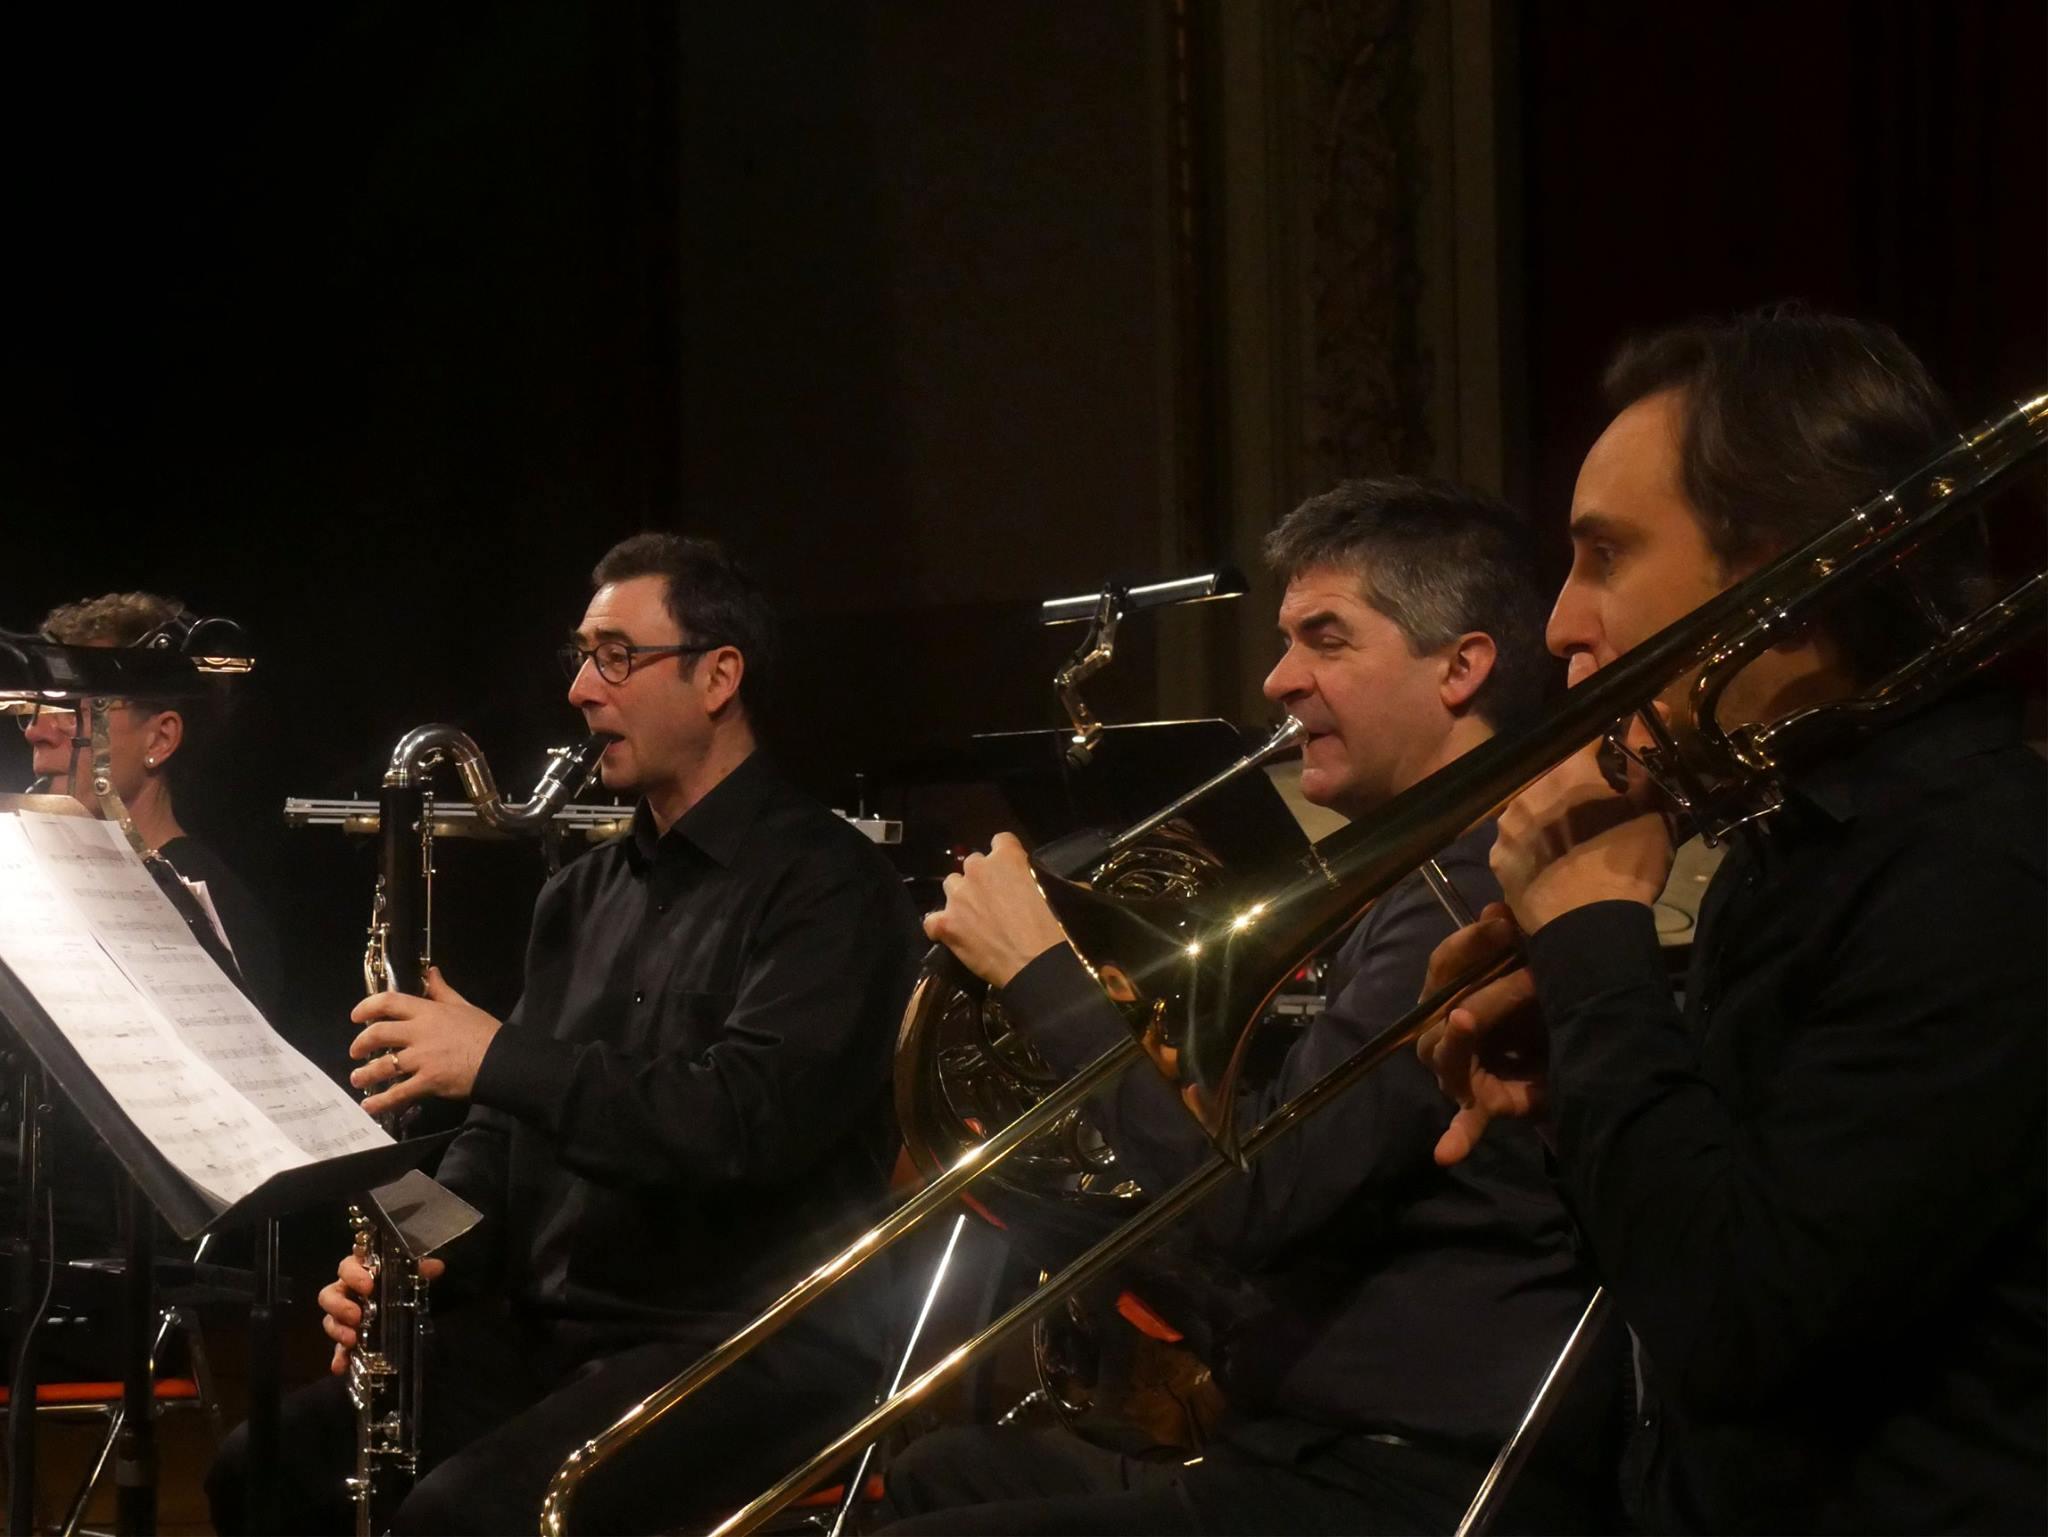 Playing Horos - Ensemble Orchestral Contemporain